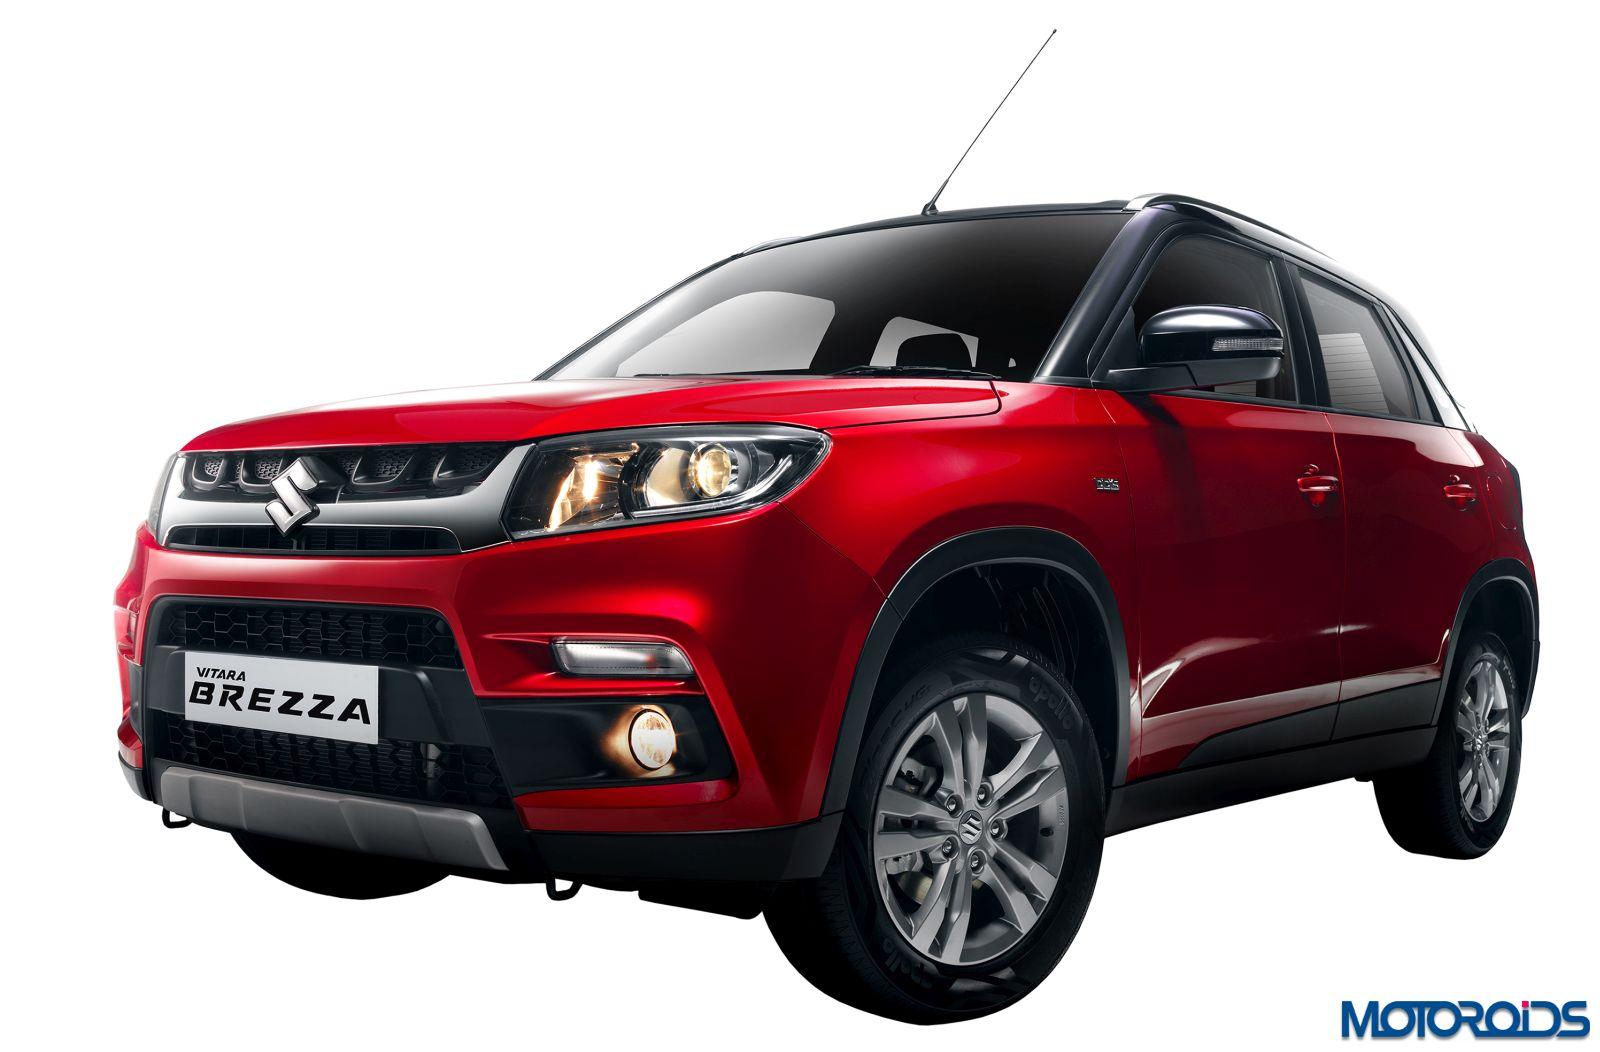 Suzuki Brezza Petrol